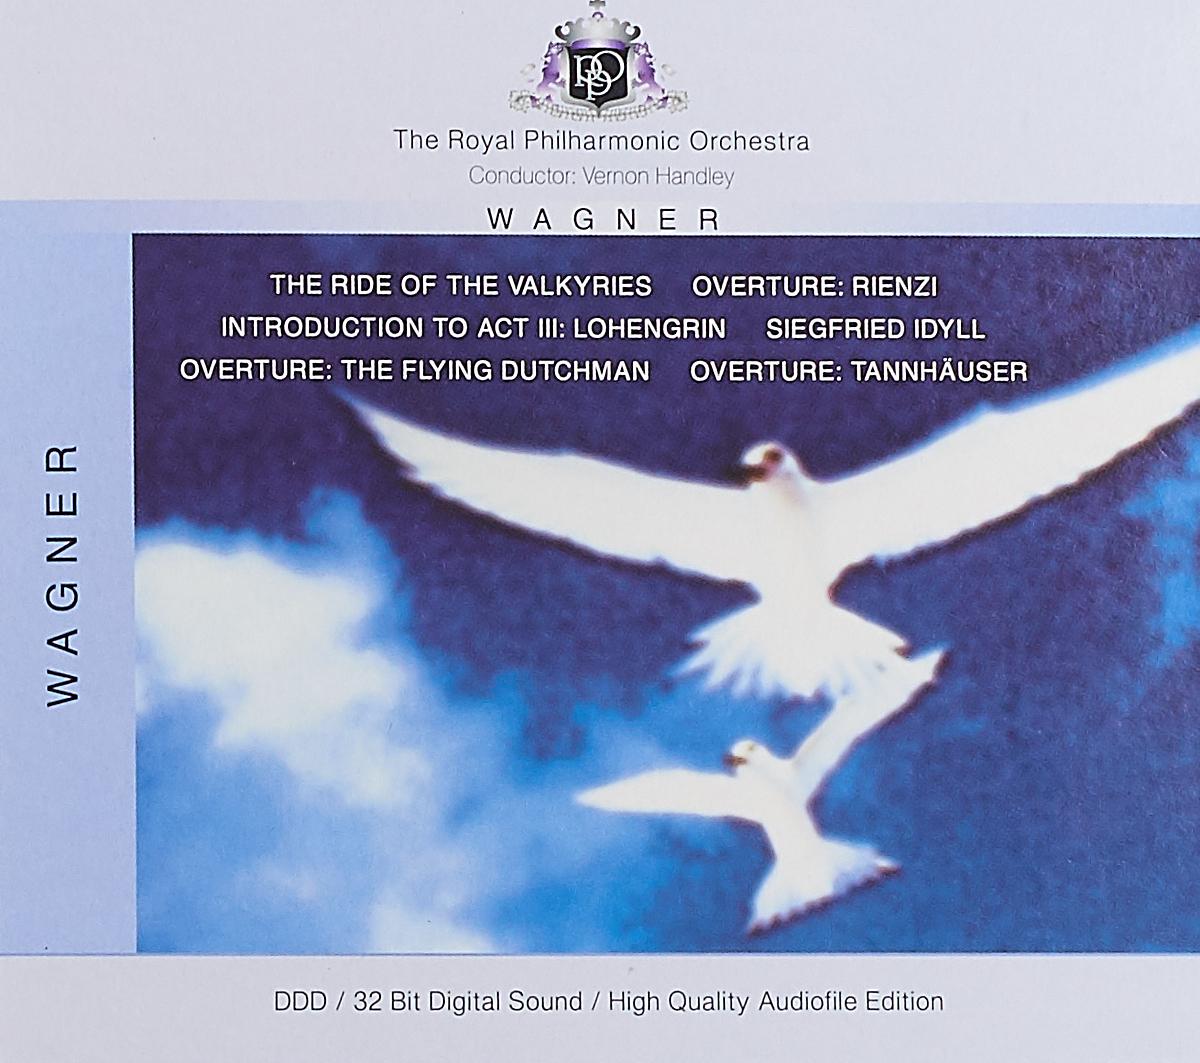 цена на The Royal Philharmonic Orchestra The Royal Philharmonic Orchestra. Wagner. The Ride Of The Valkyries